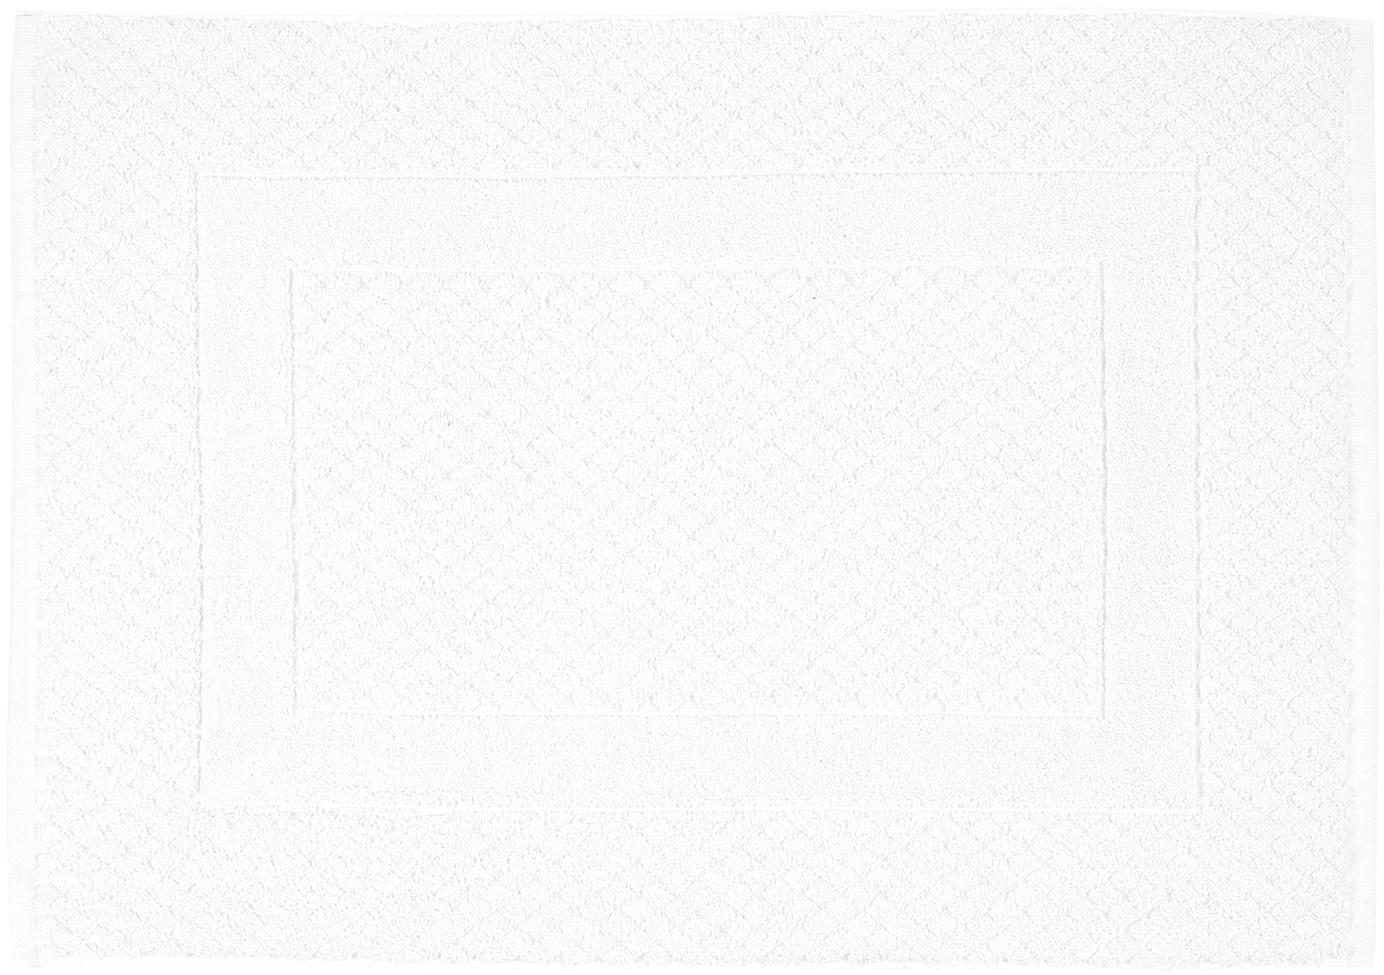 Badmat Katharina, 100% katoen, zware kwaliteit, 900 g/m², Wit, 50 x 70 cm